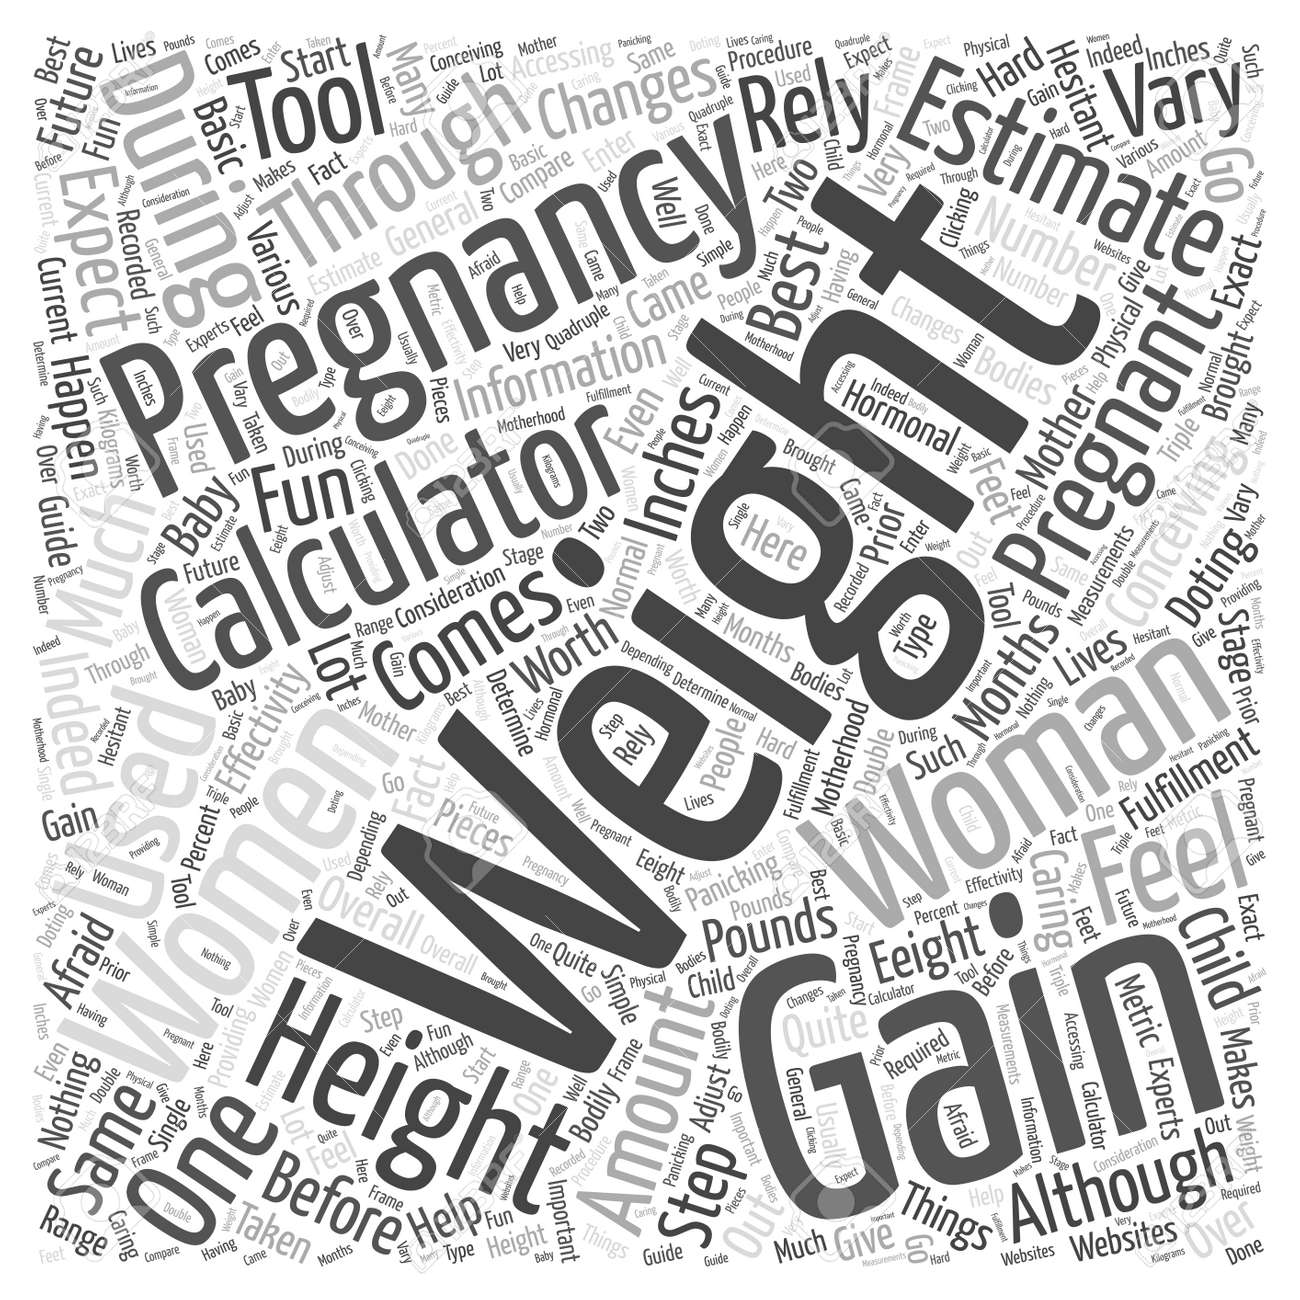 pregnancy weight gain calculator Word Cloud Concept